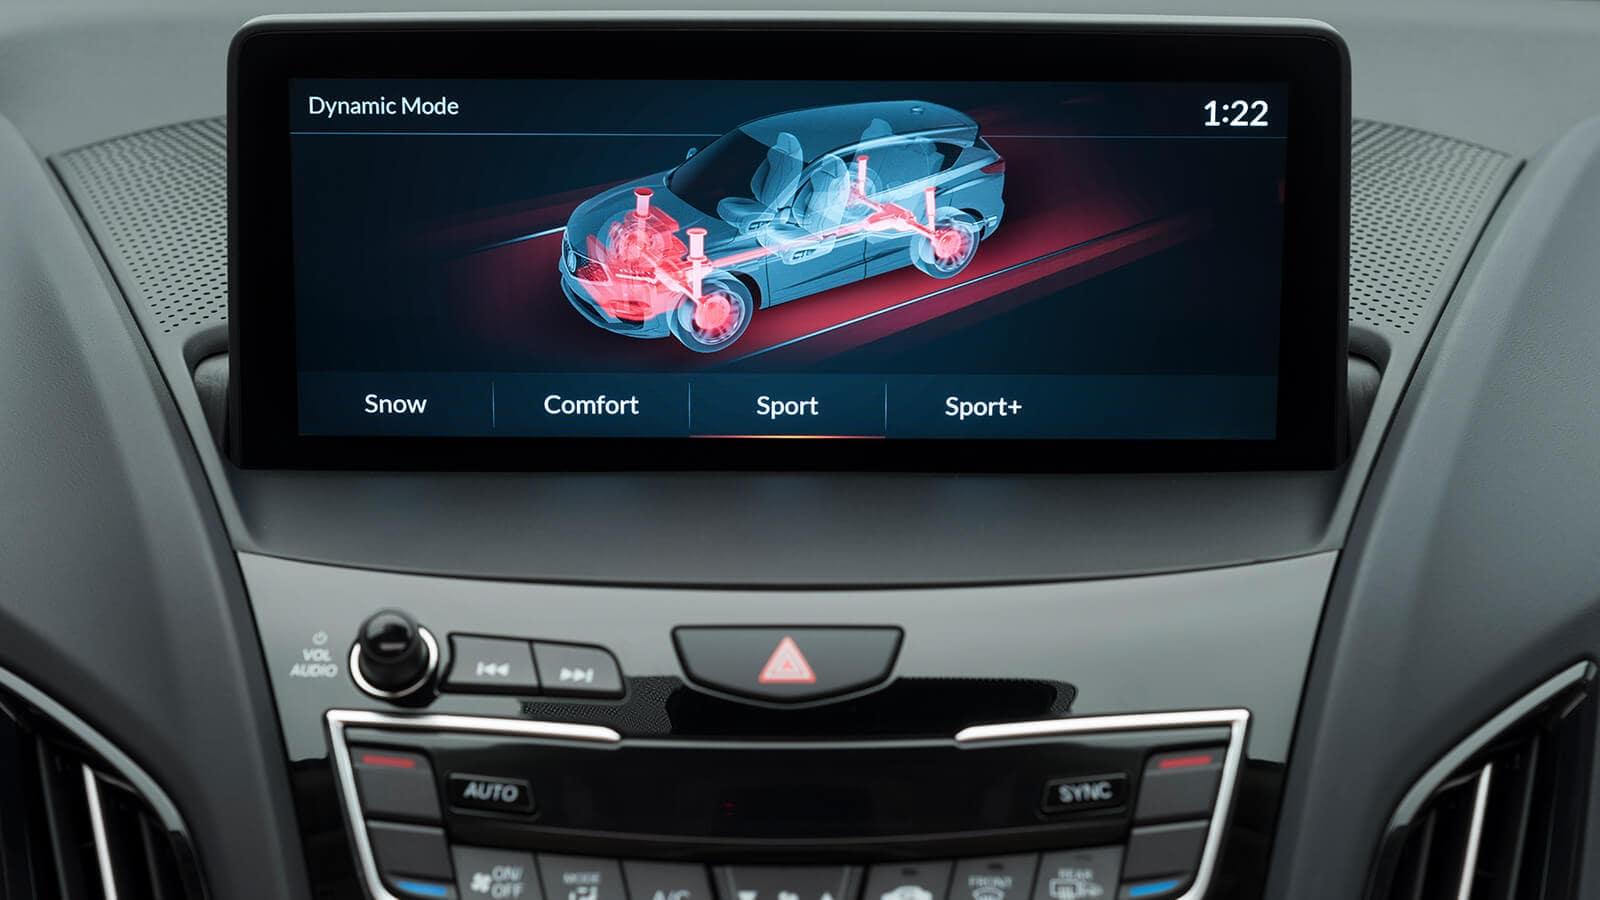 2020 Acura RDX Interior Integrated Dynamics System